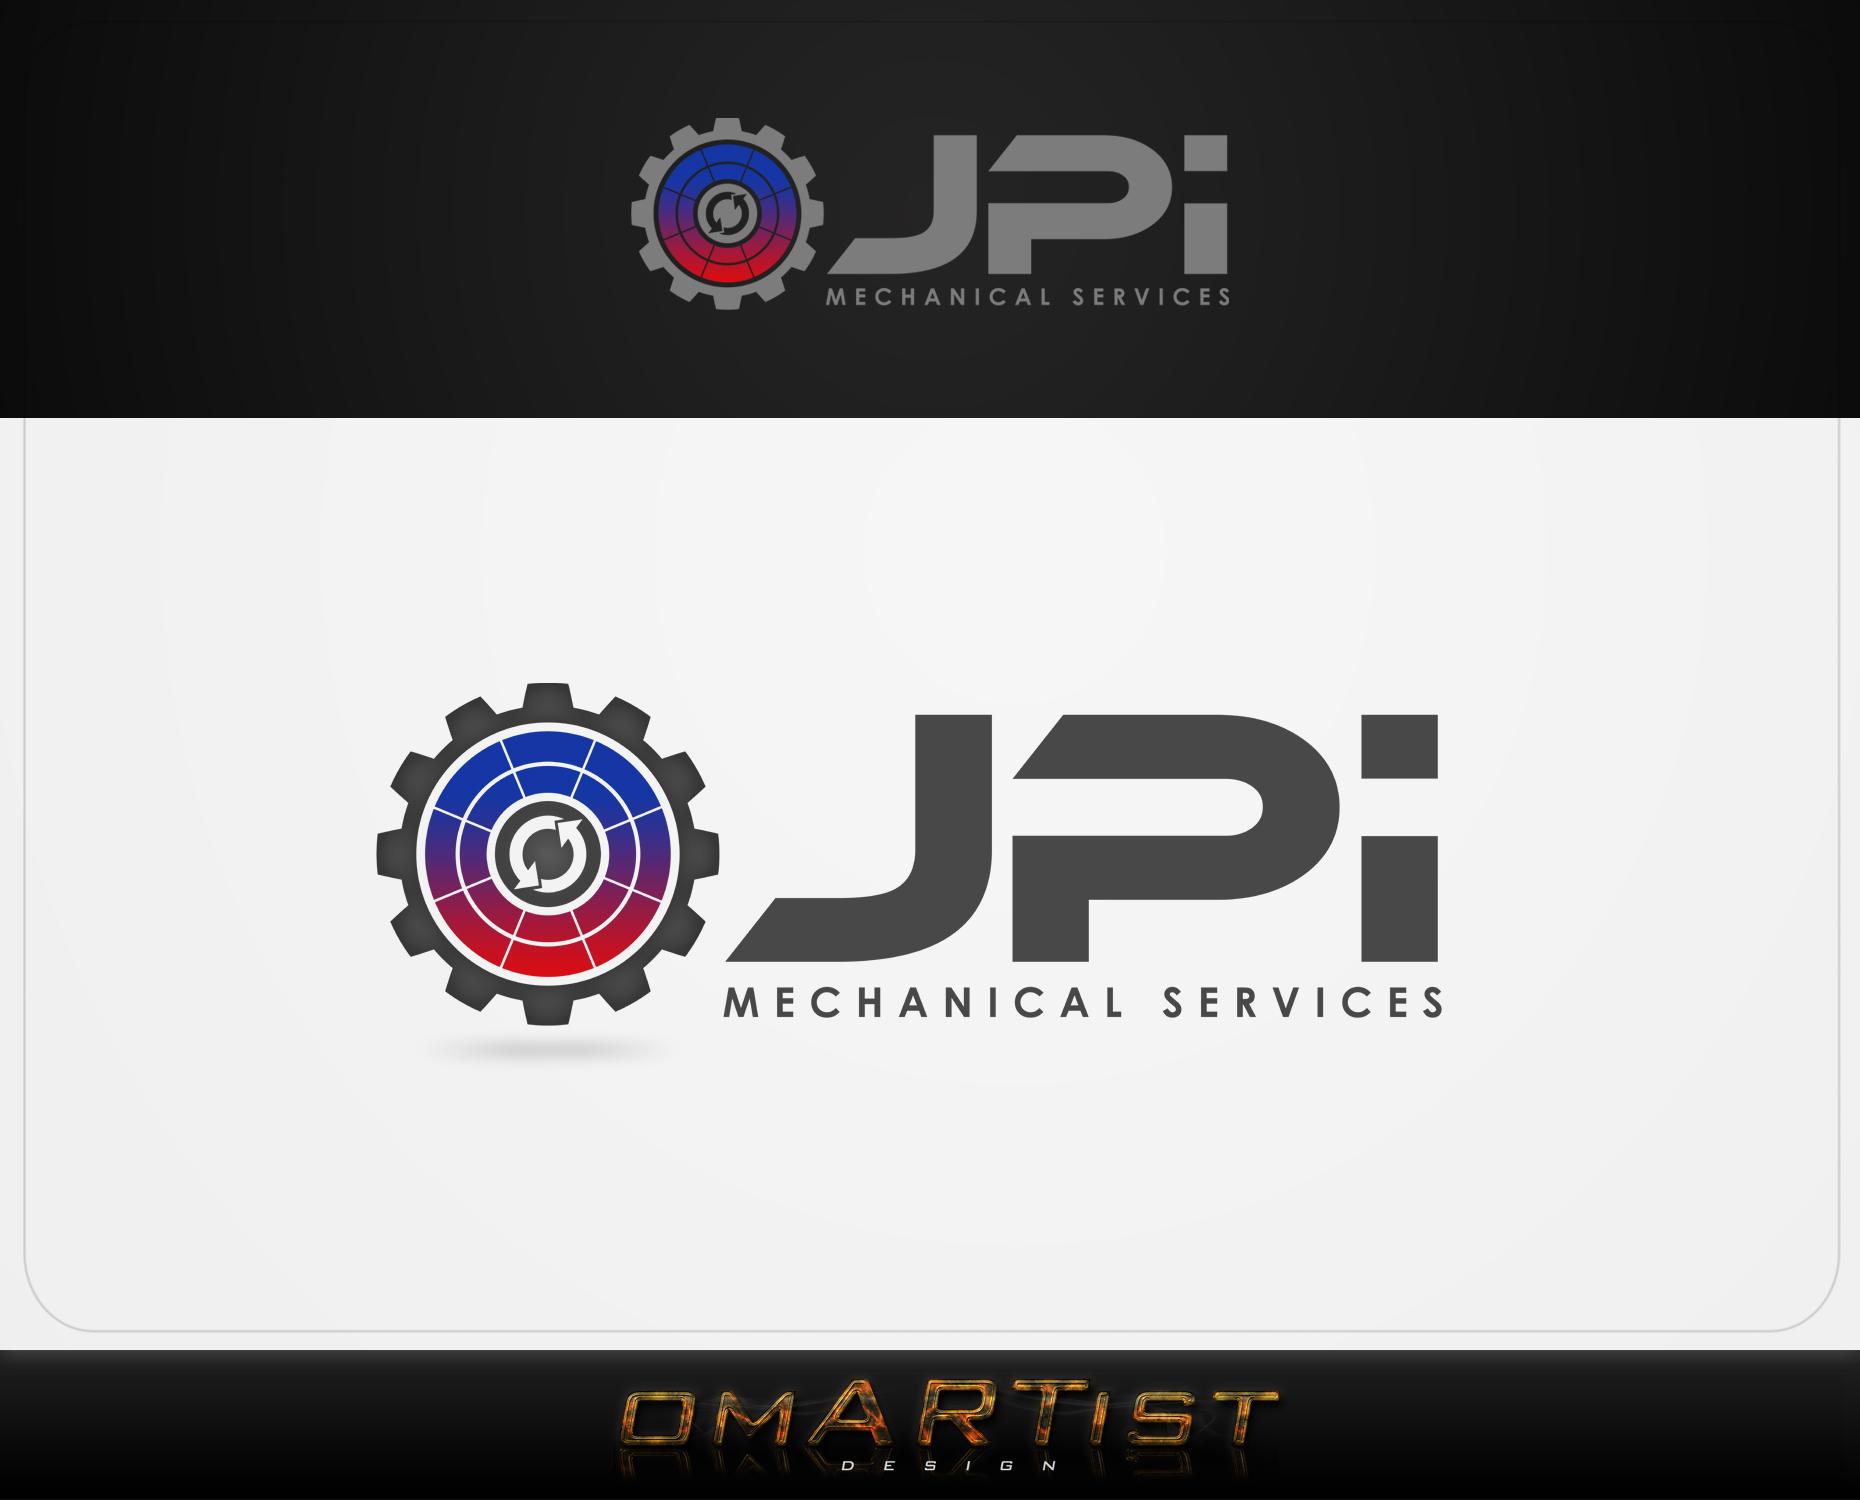 Logo Design by omARTist - Entry No. 59 in the Logo Design Contest Inspiring Logo Design for JPI Mecanical Services.